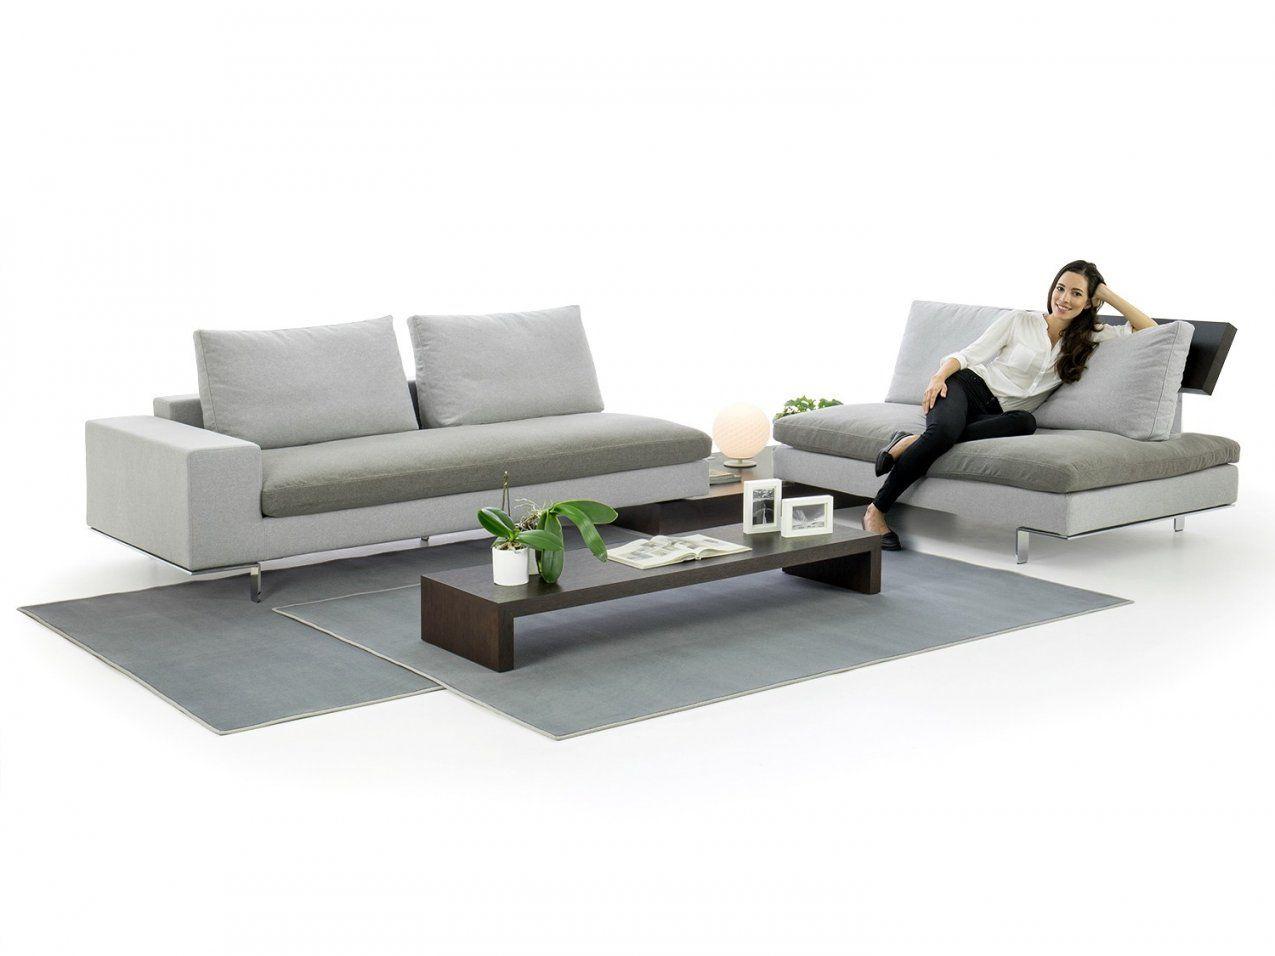 Freesofa Modulares Sofa Mit Integriertem Tisch  Homeplaneur von Sofa Mit Integriertem Tisch Photo